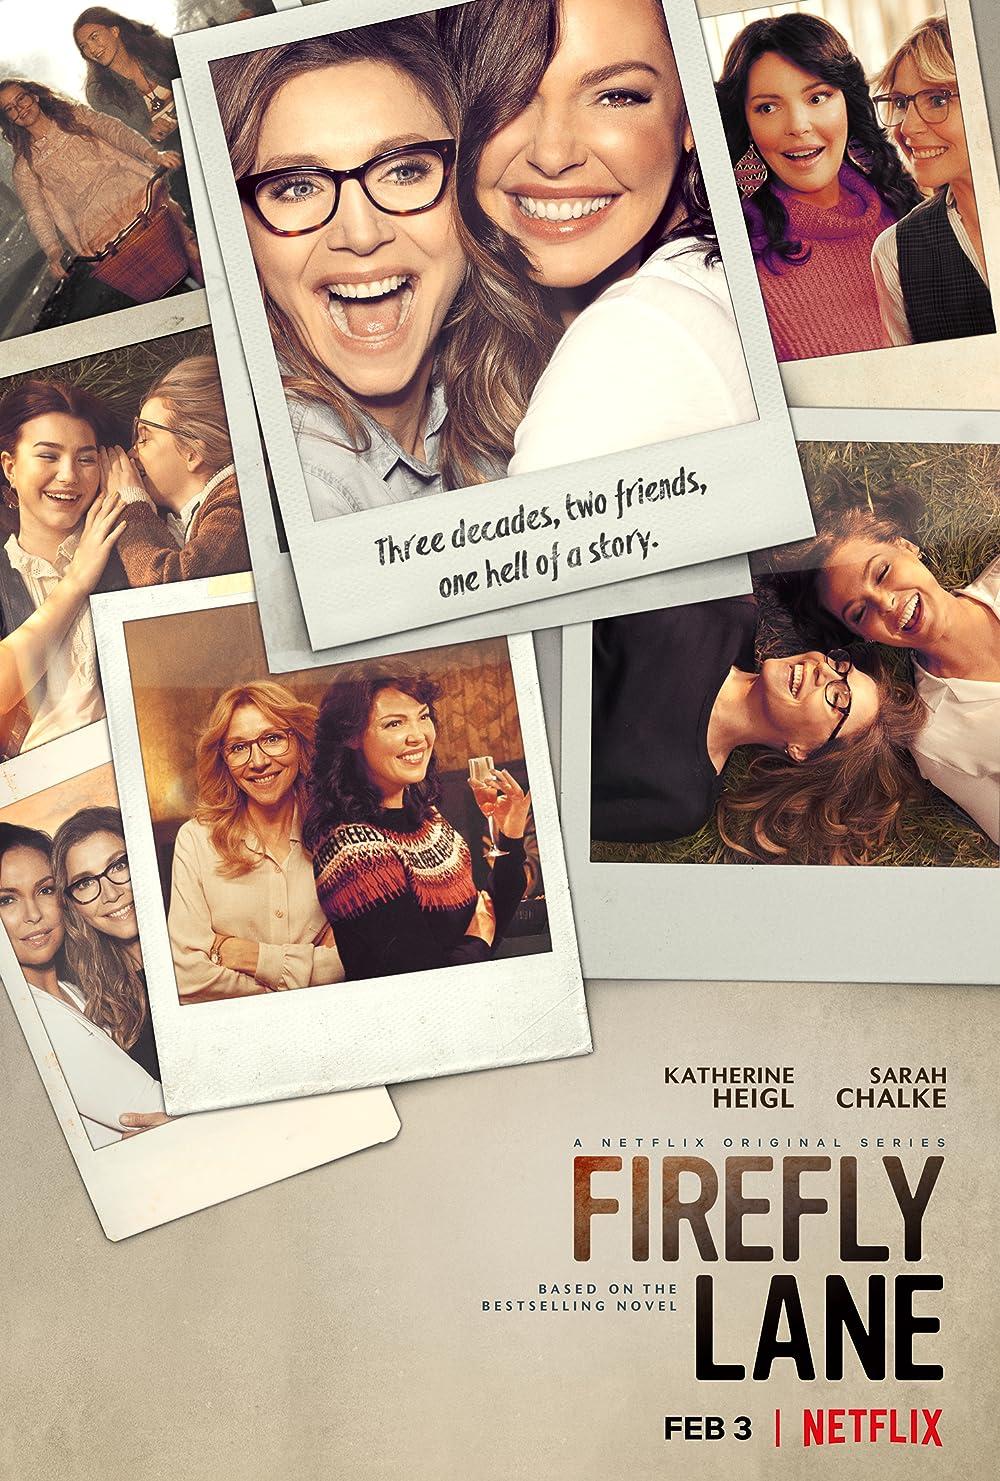 Download Firefly Lane 2021 S01 Complete Hindi Netflix Original Series 480p HDRip 1.6GB